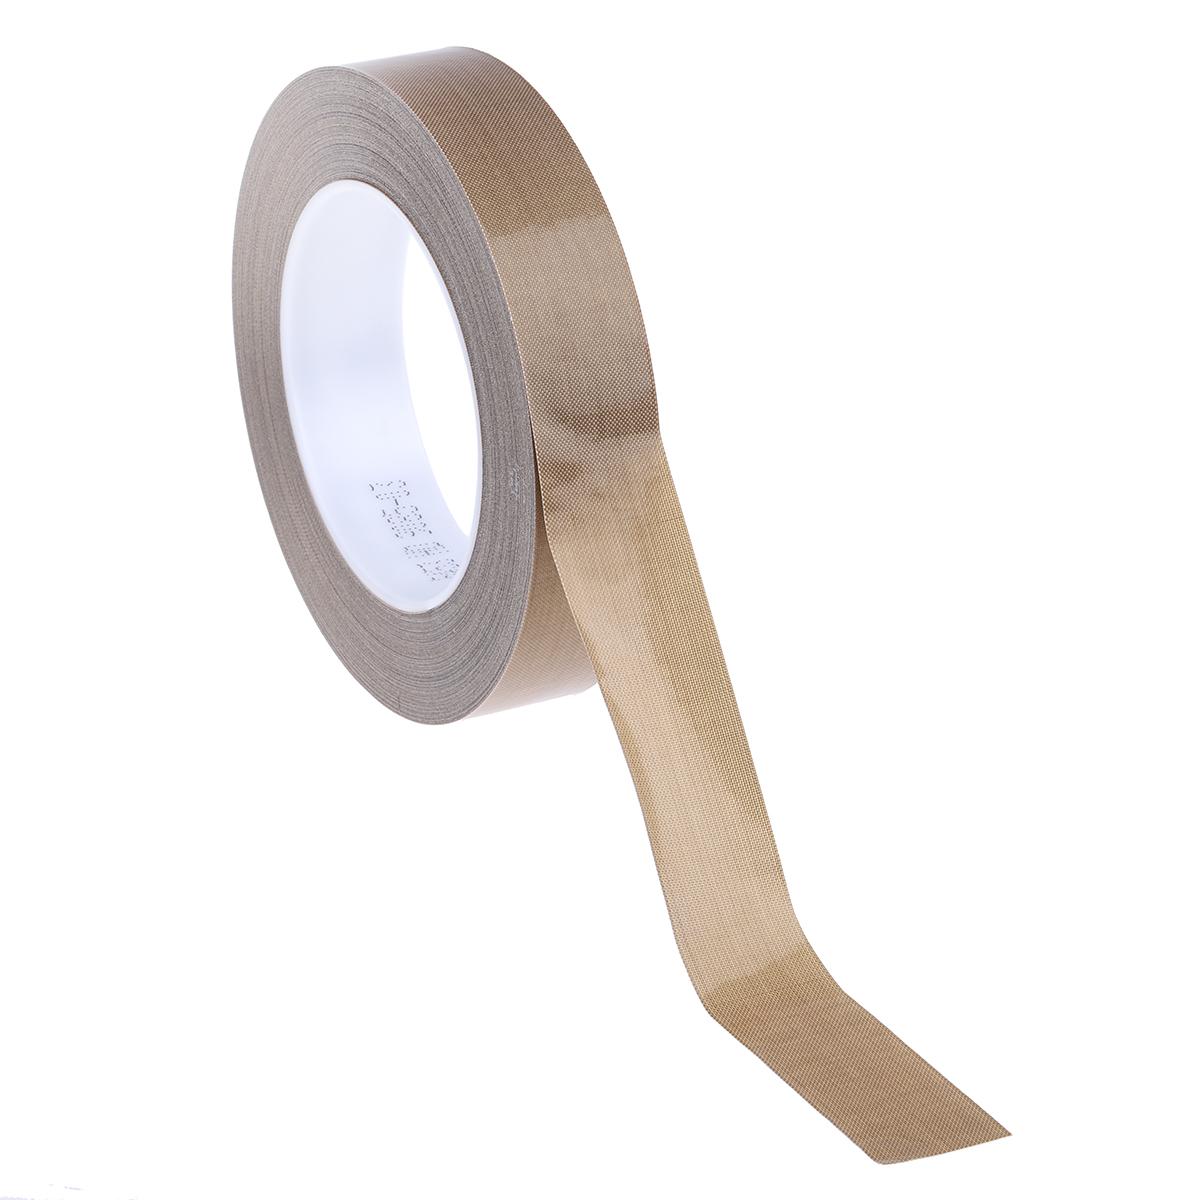 PTFE Tape Guide